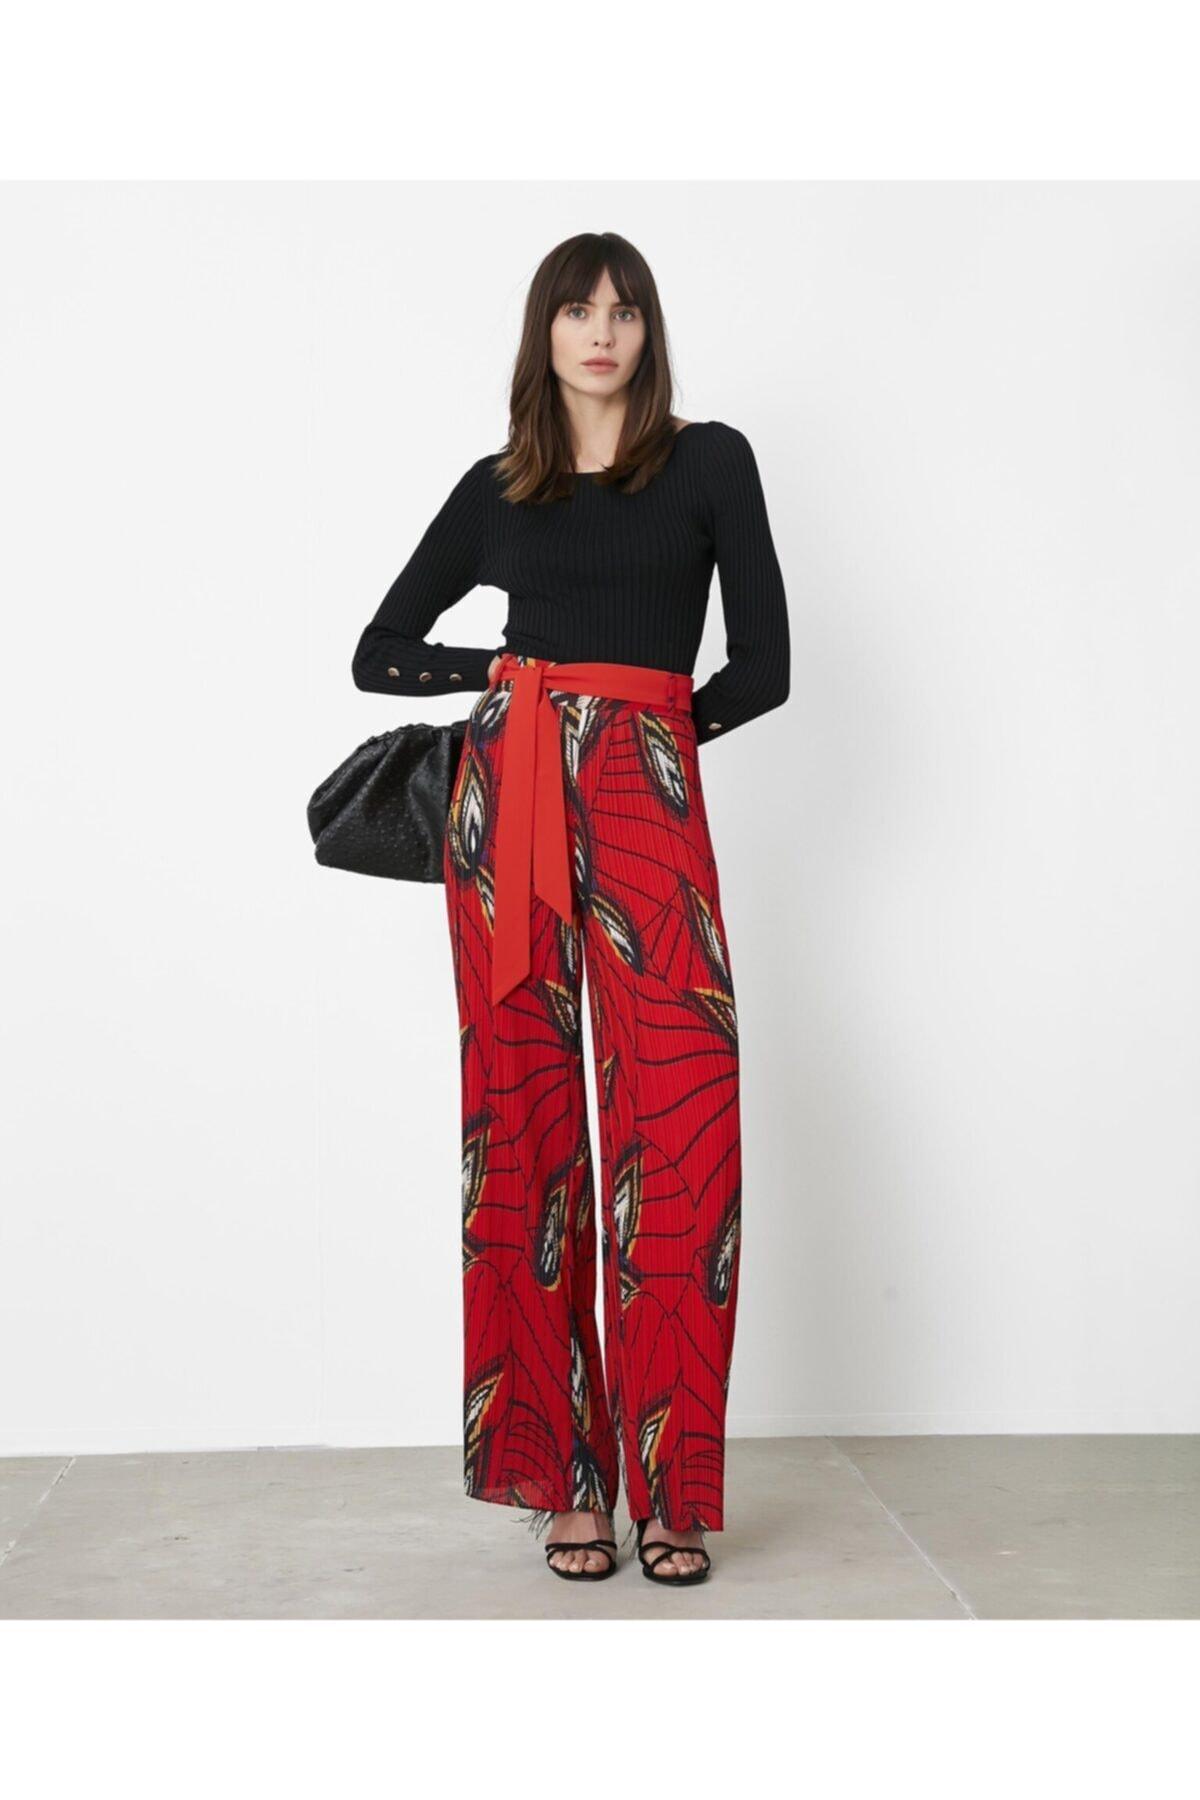 İpekyol Yüksek Bel Desenli Pantolon 1